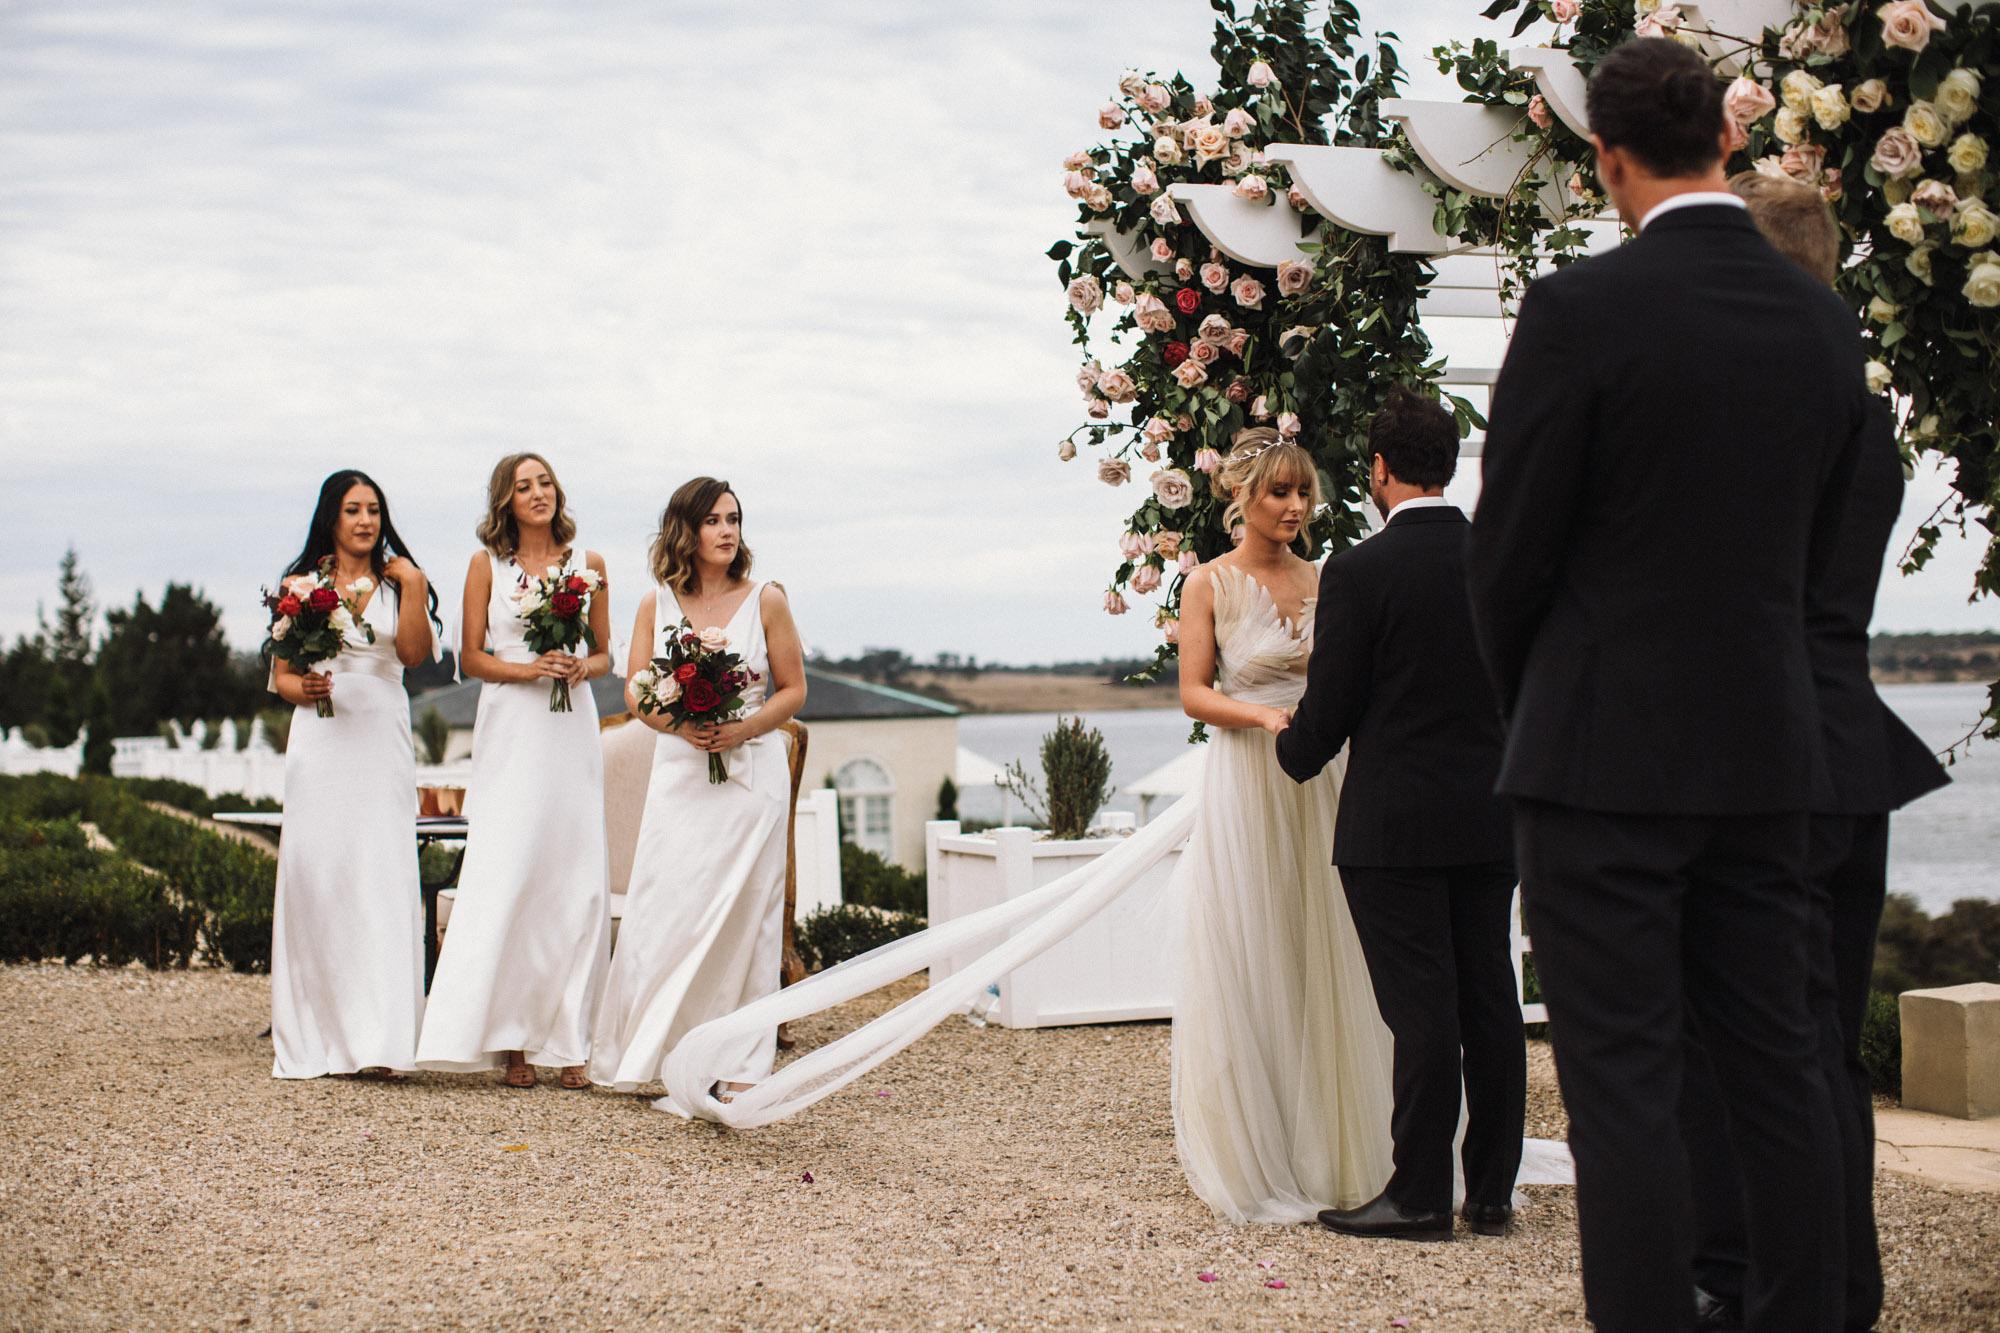 Campbell Point House Wedding HJ + Dean Raphael Weddings-75.jpg